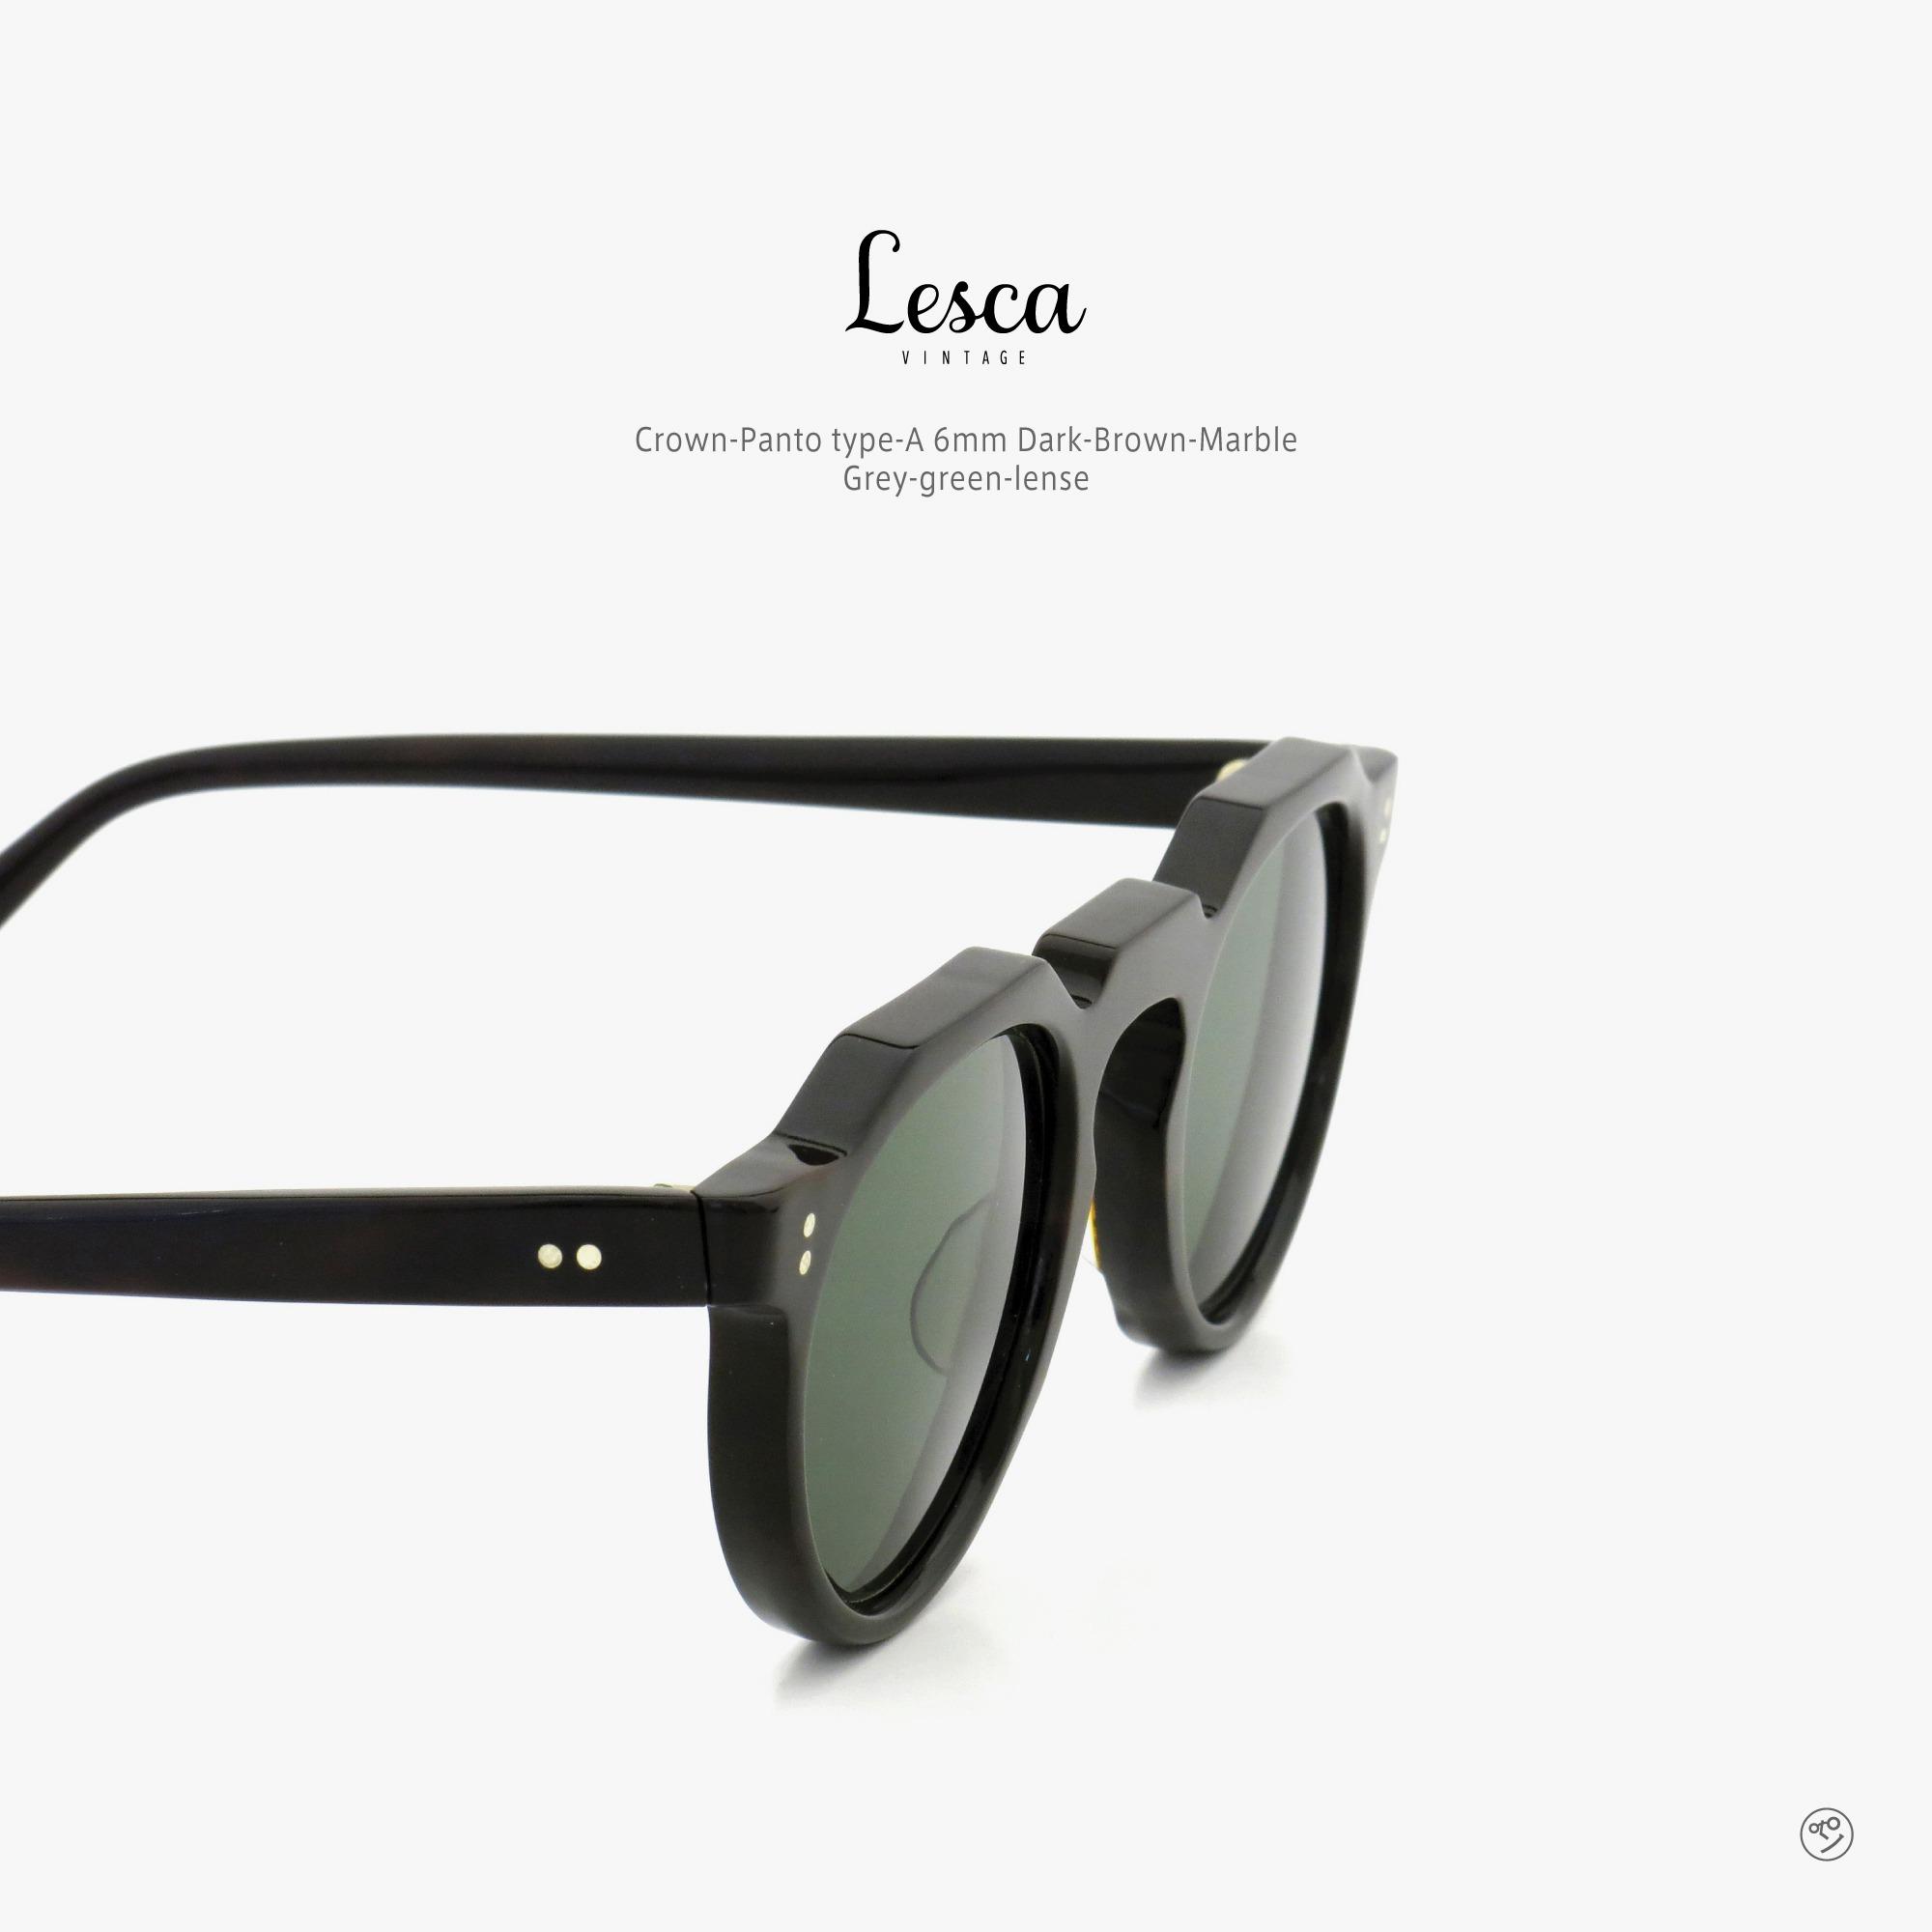 lesca-vintage_Crown-Panto_type-A_6mm_Dark-Brown-Marble_Grey-green-lense_insta